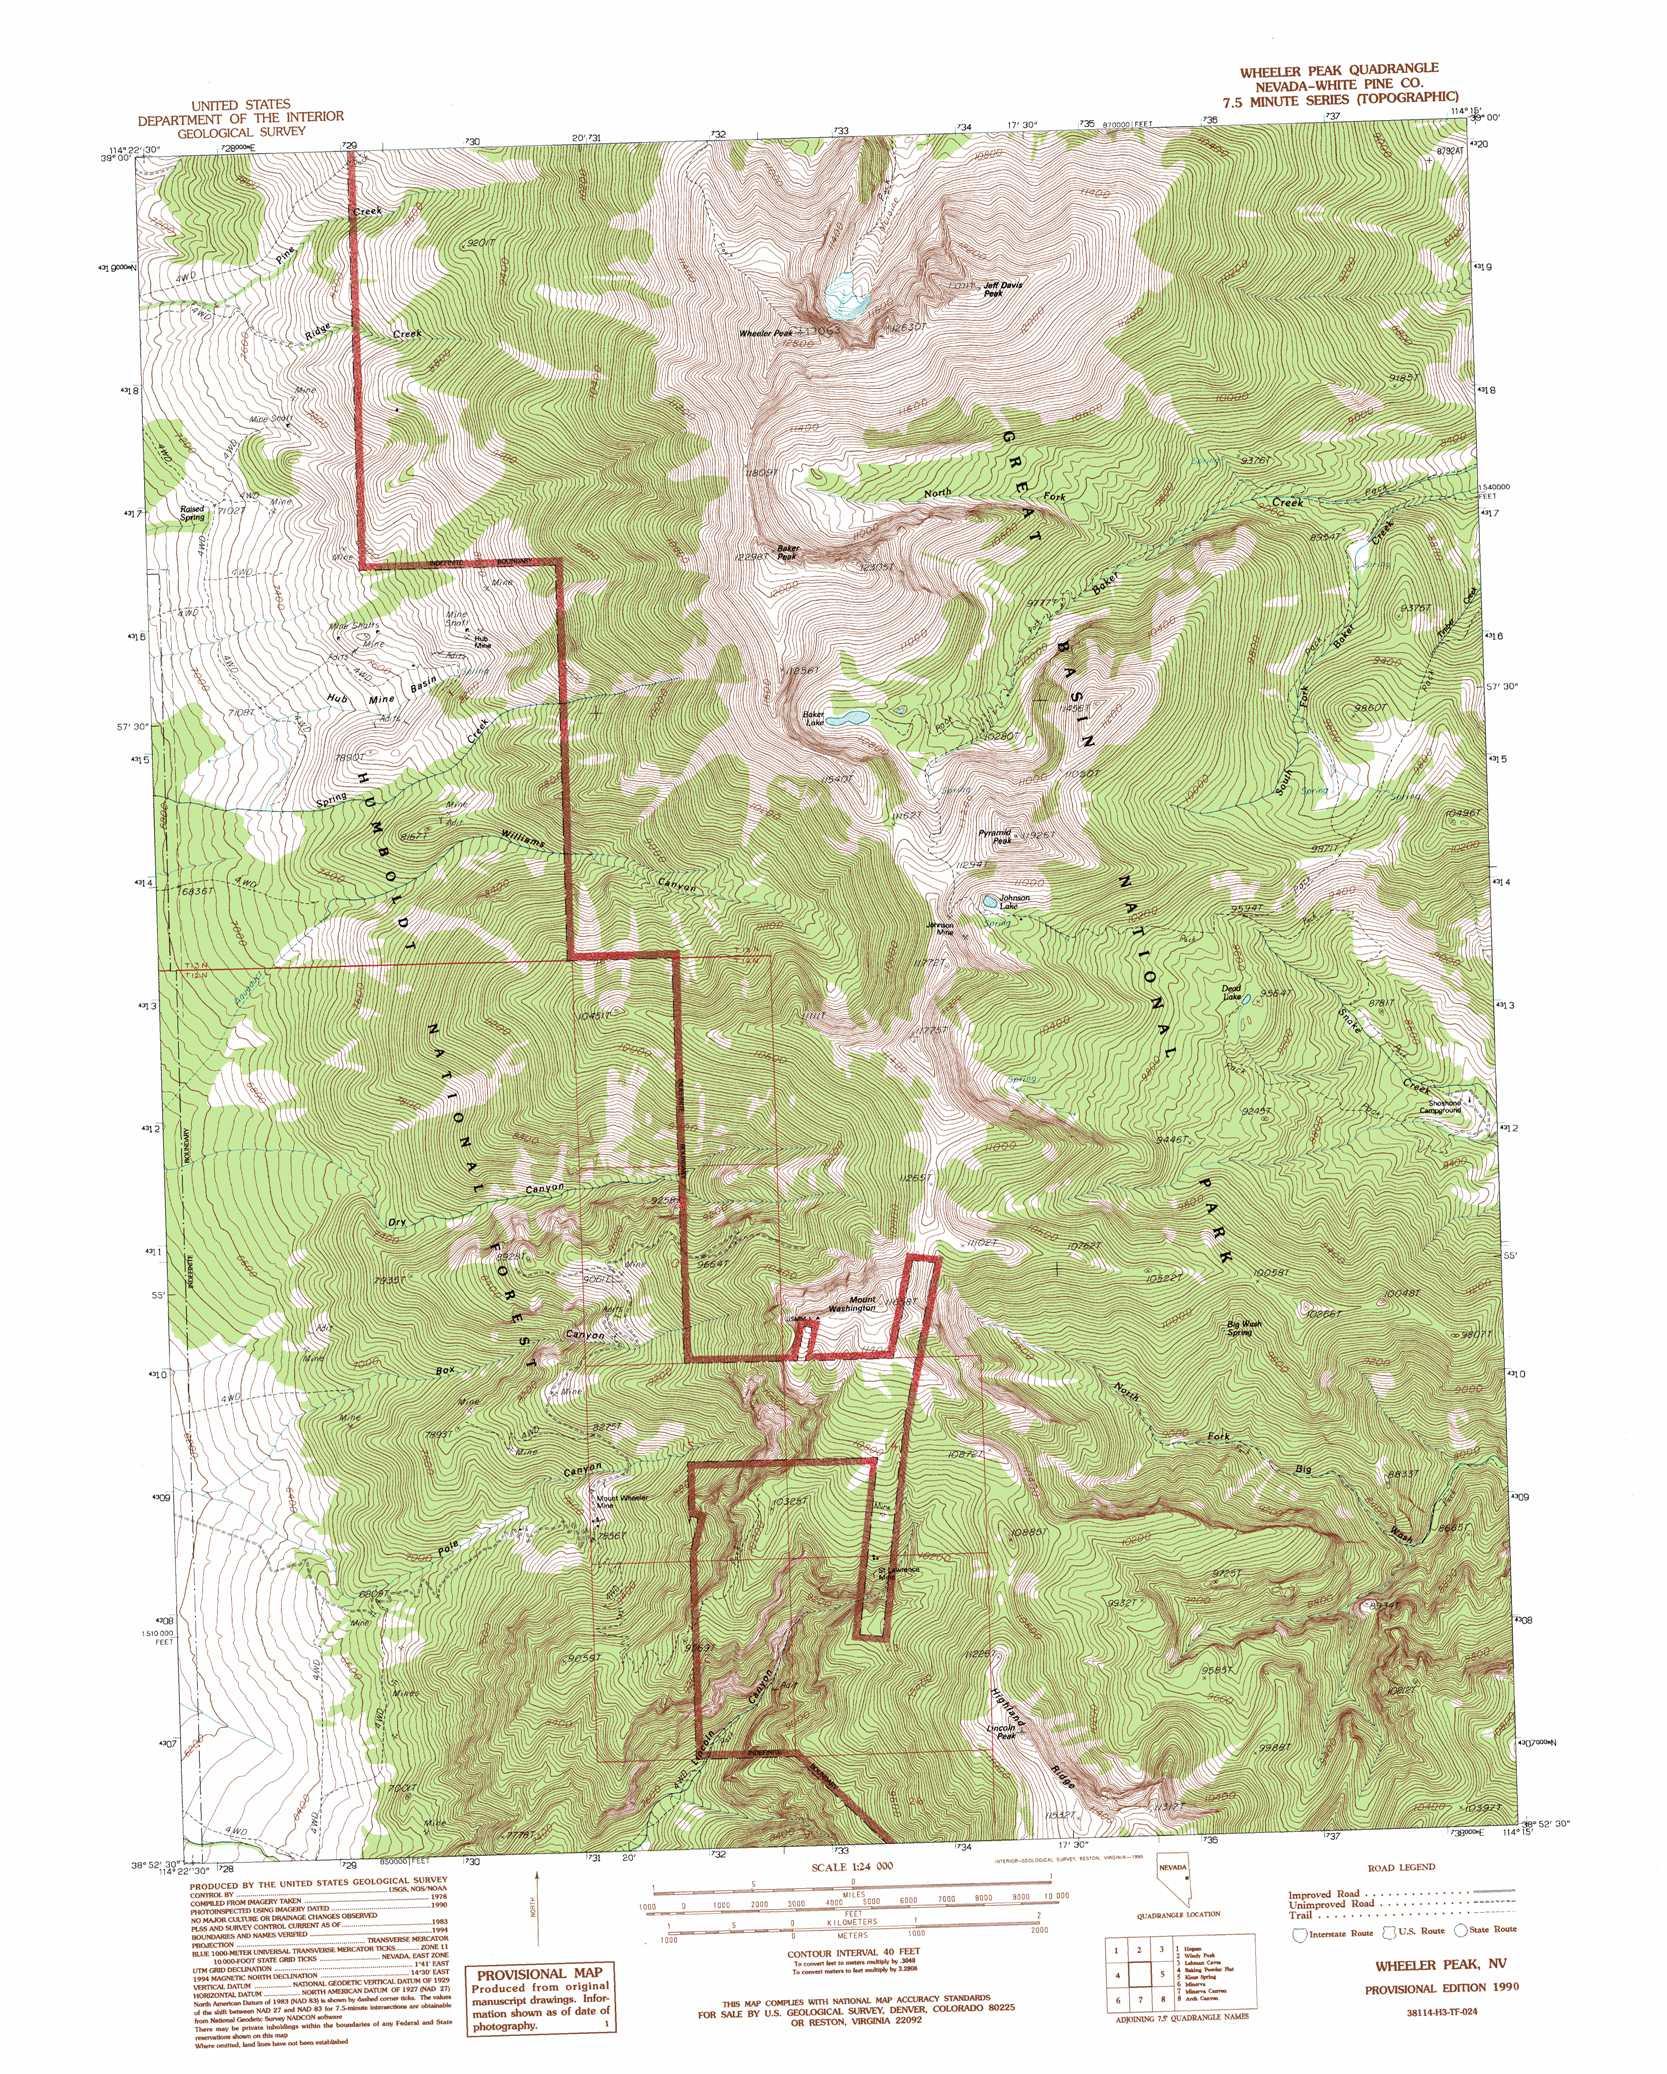 Wheeler Peak Topographic Map NV USGS Topo Quad H - Us geological topographic maps